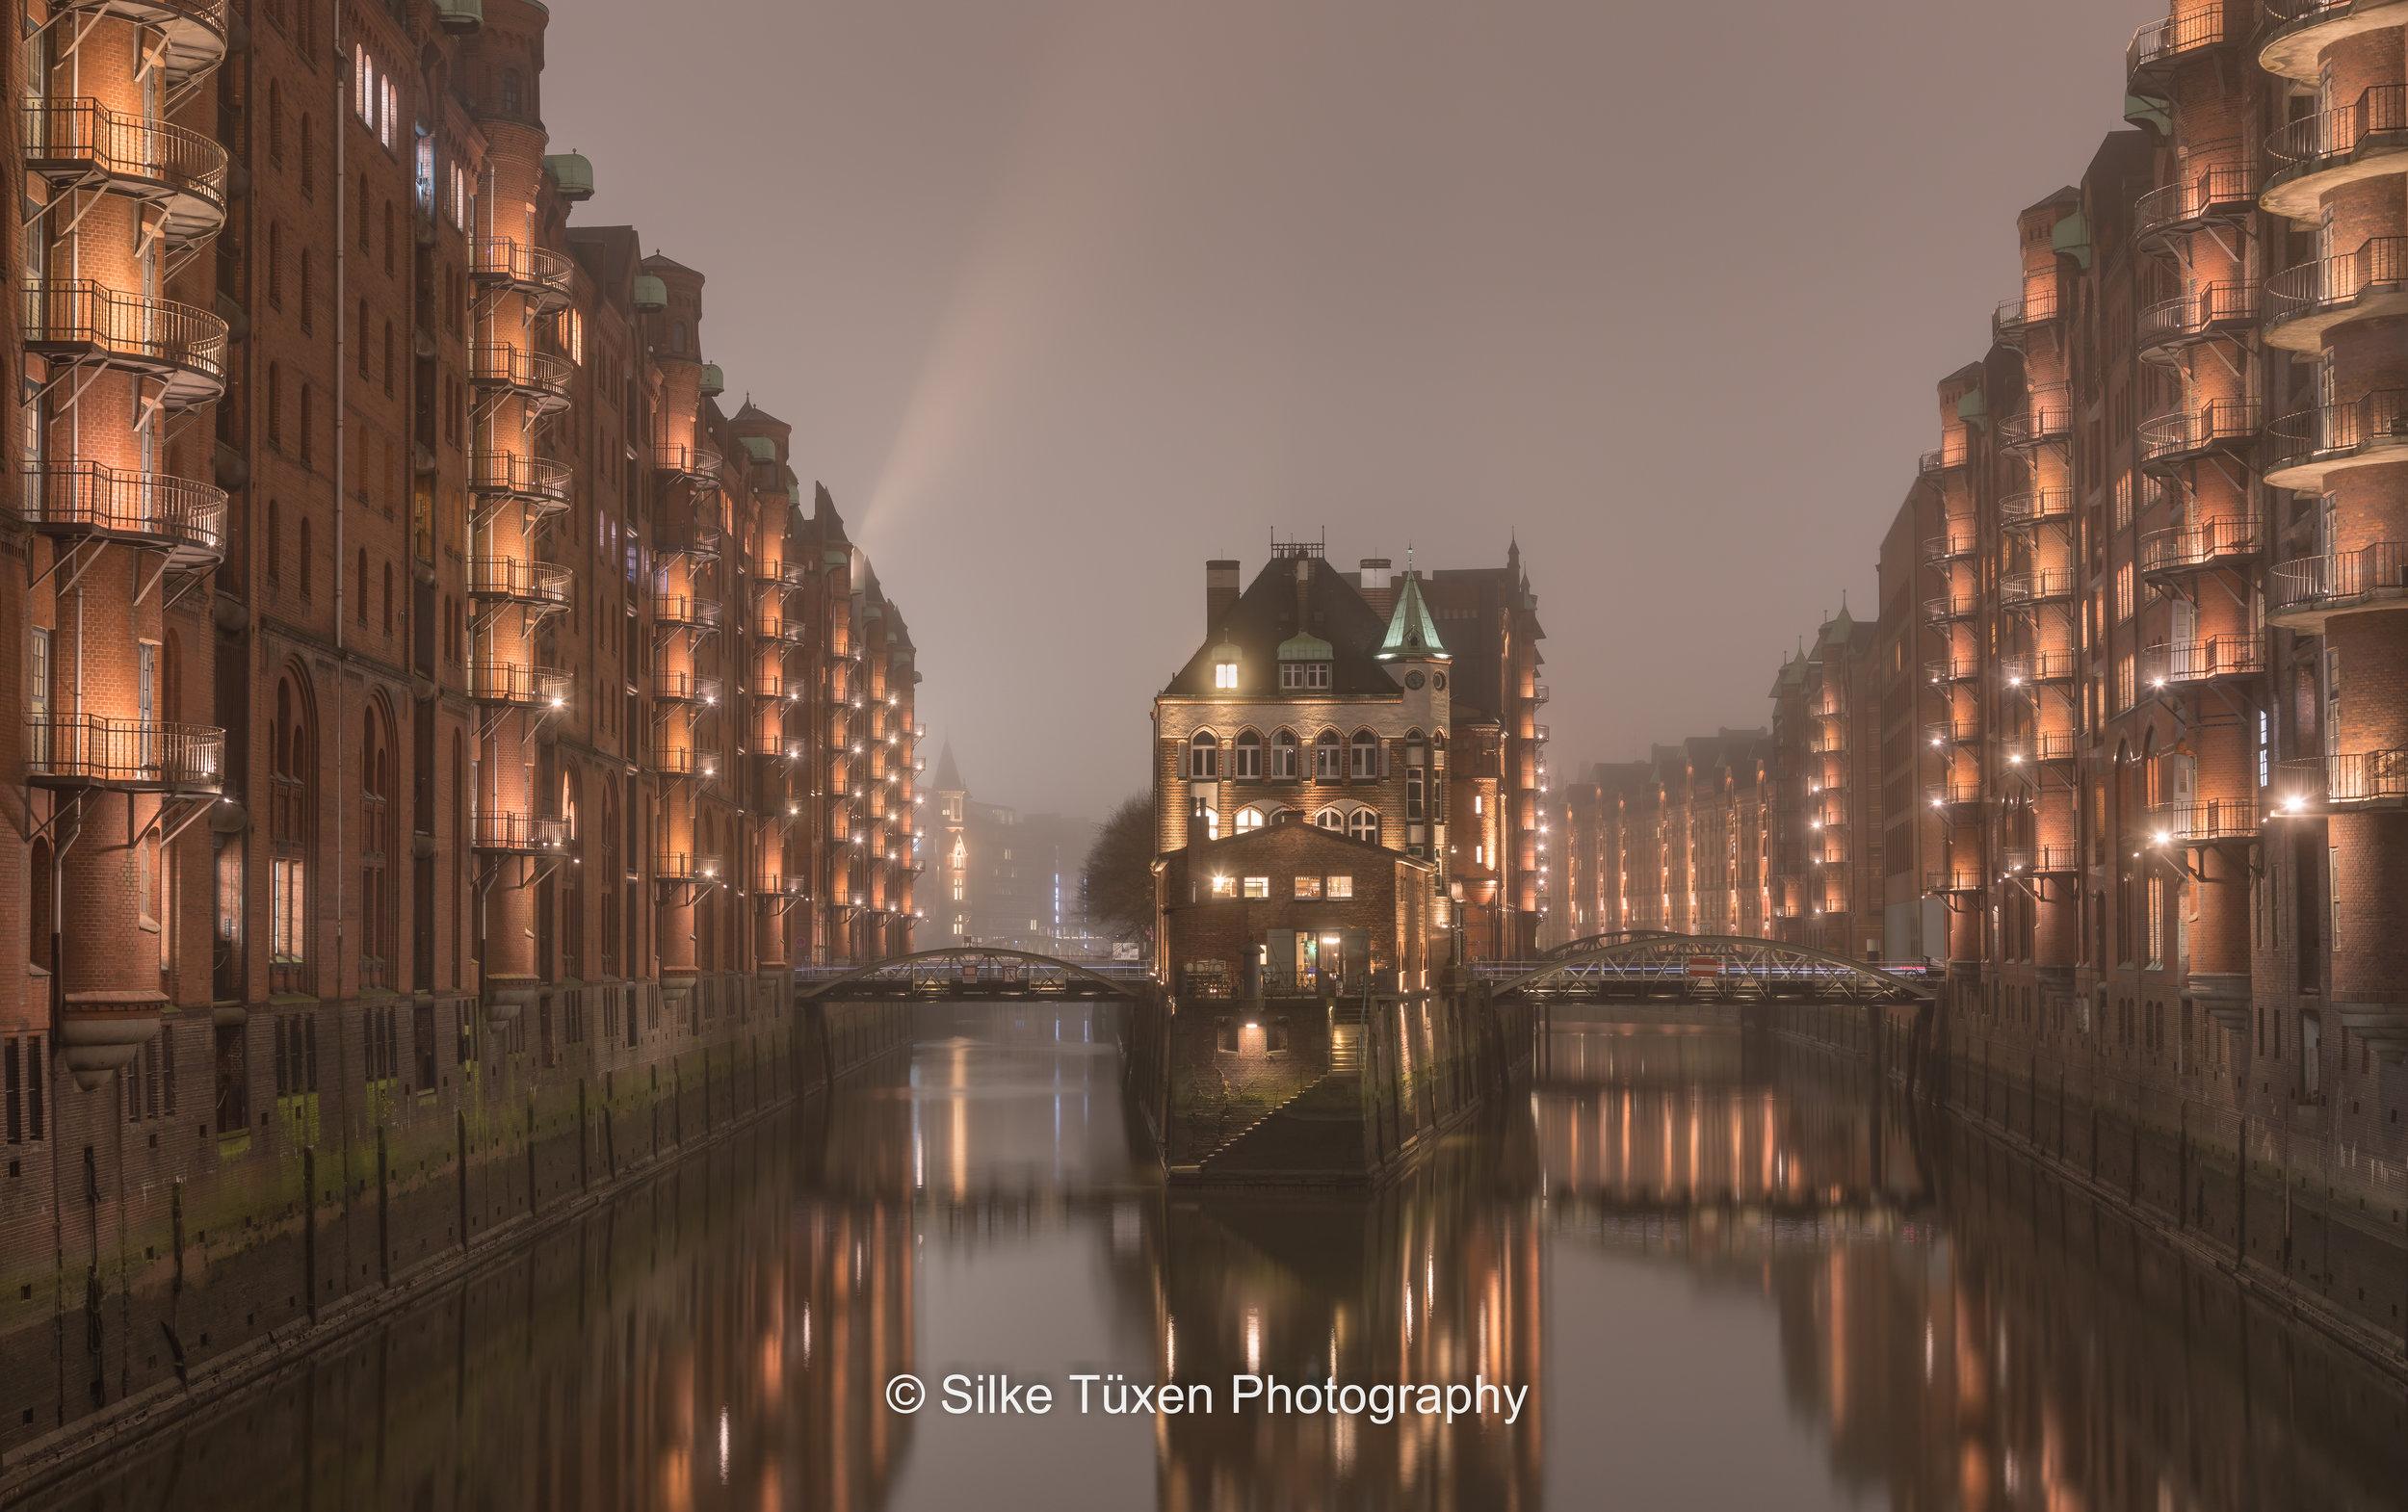 Foggy evening, old Hamburg - Nebliger Abend, alt Hamburg